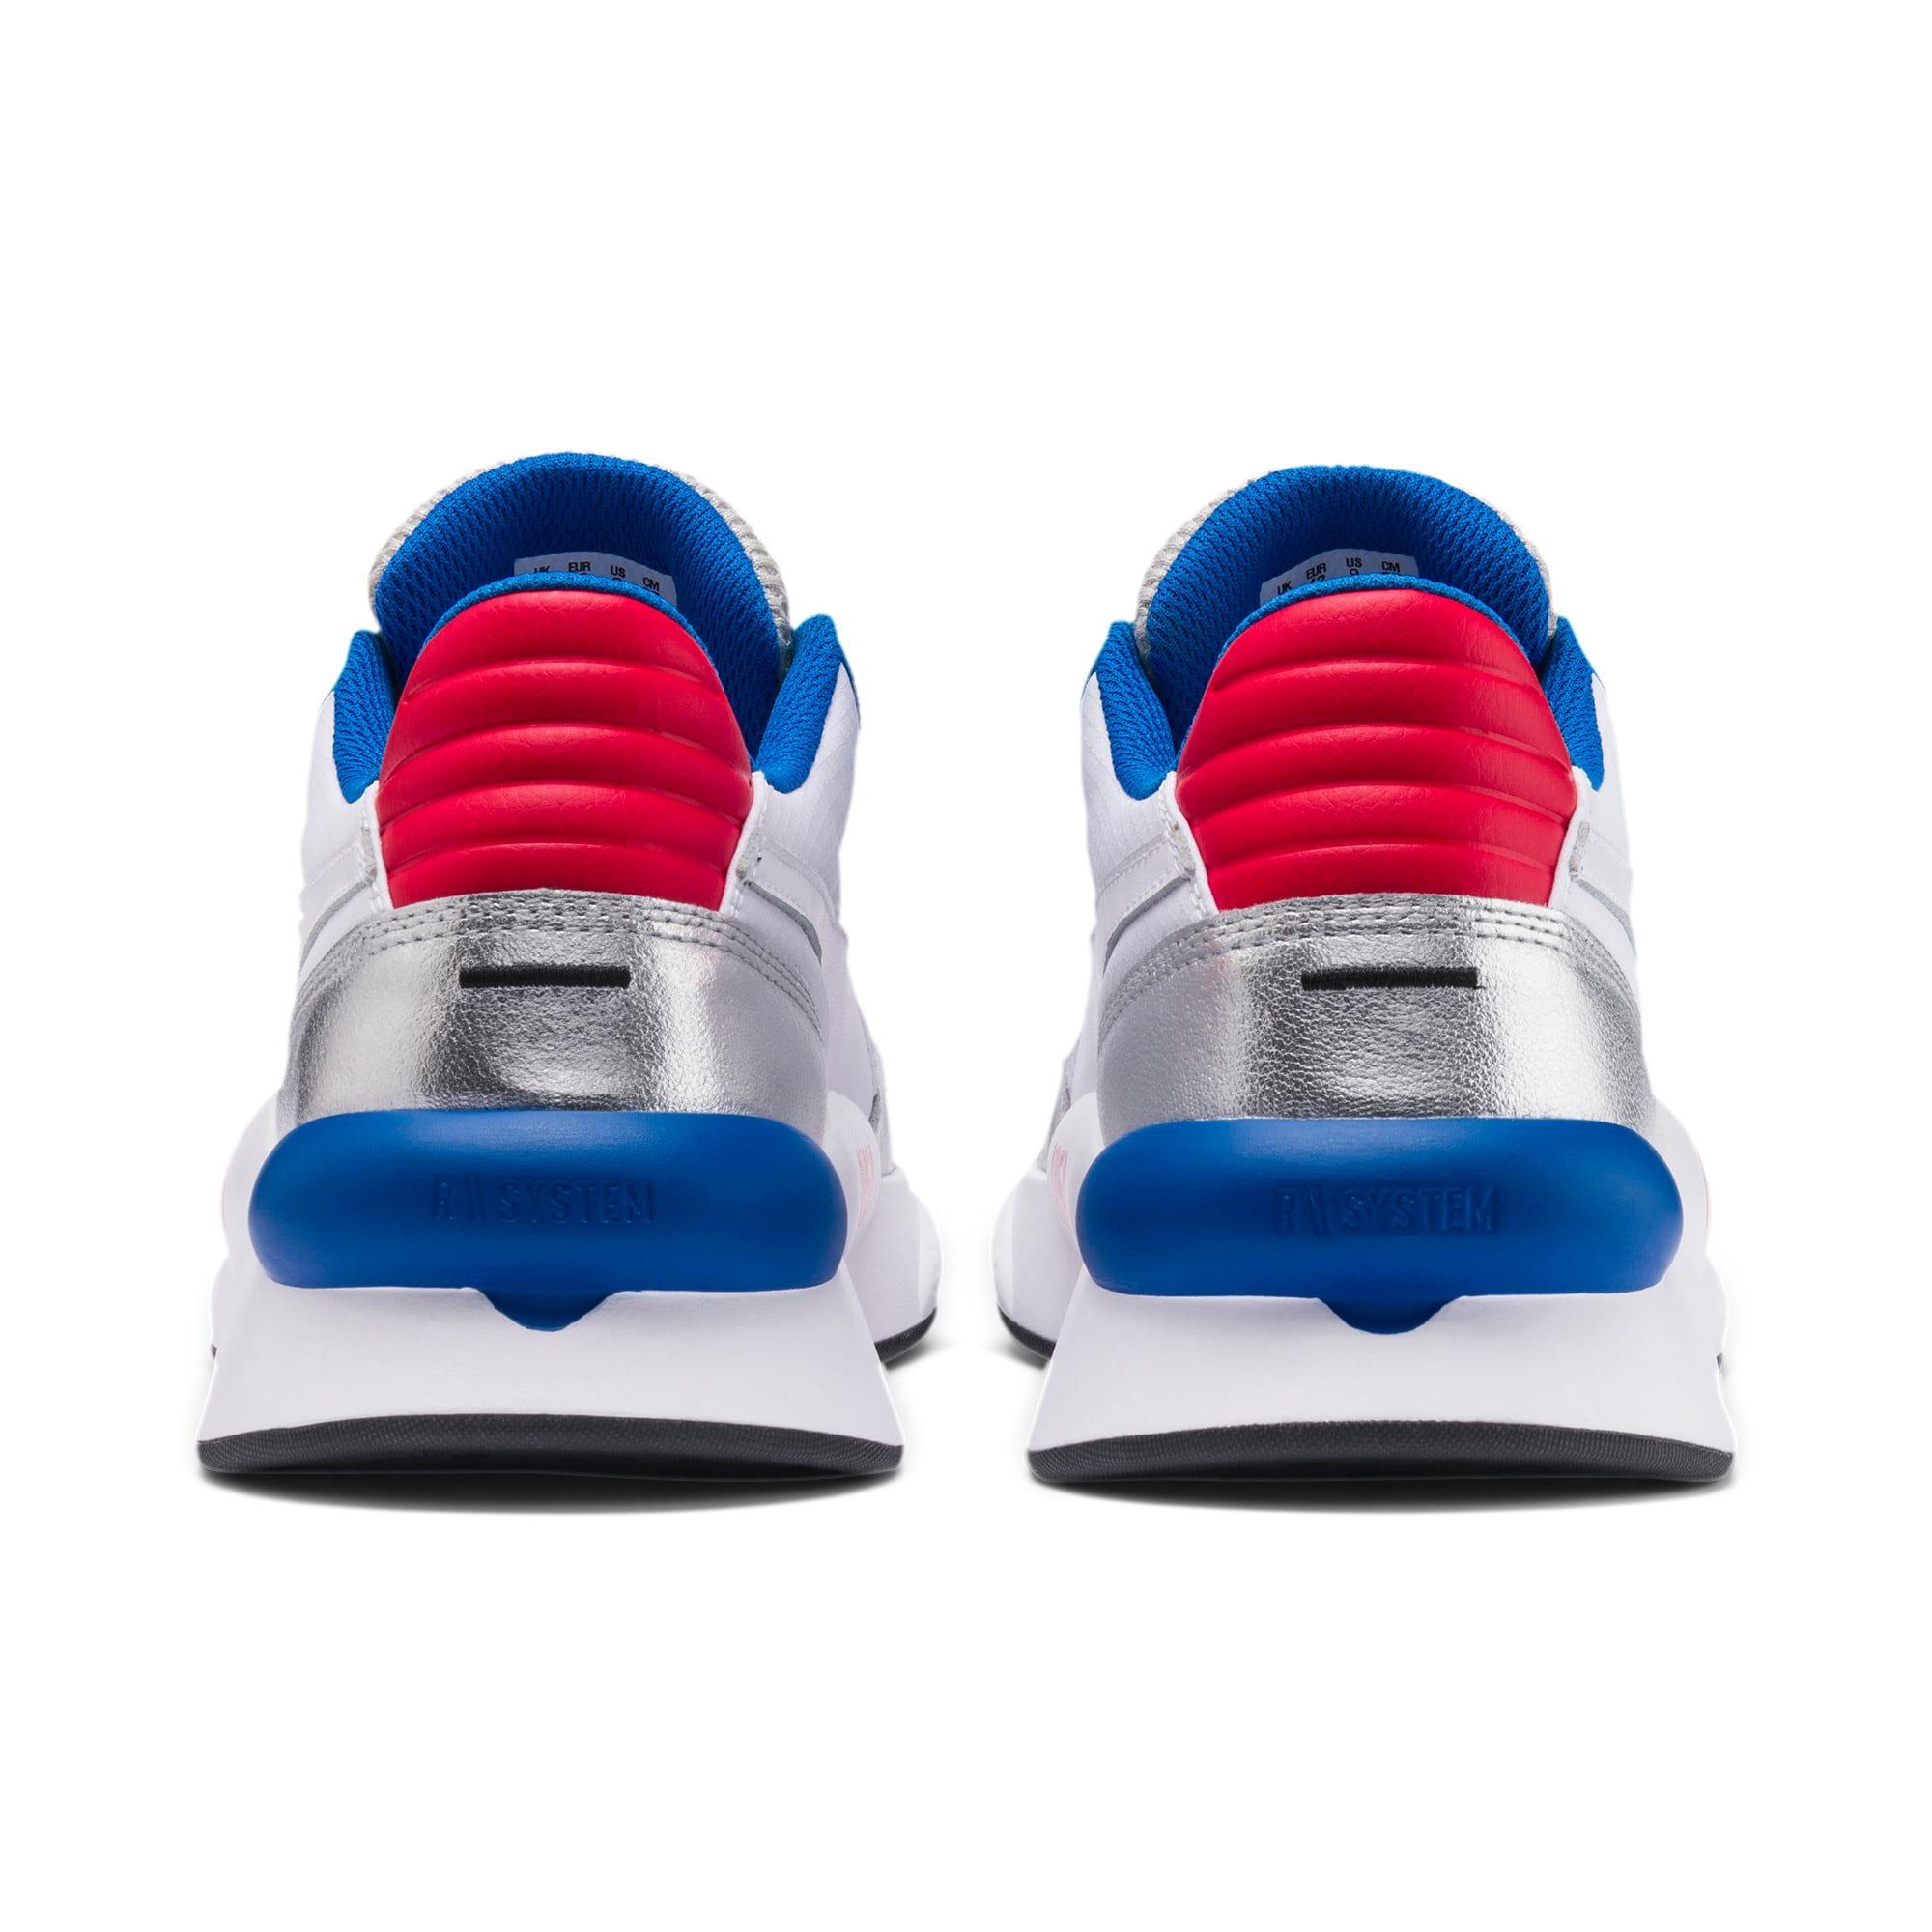 Thumbnail 3 of RS 9.8 Space Explorer Sneaker, Puma White-Puma Silver, medium